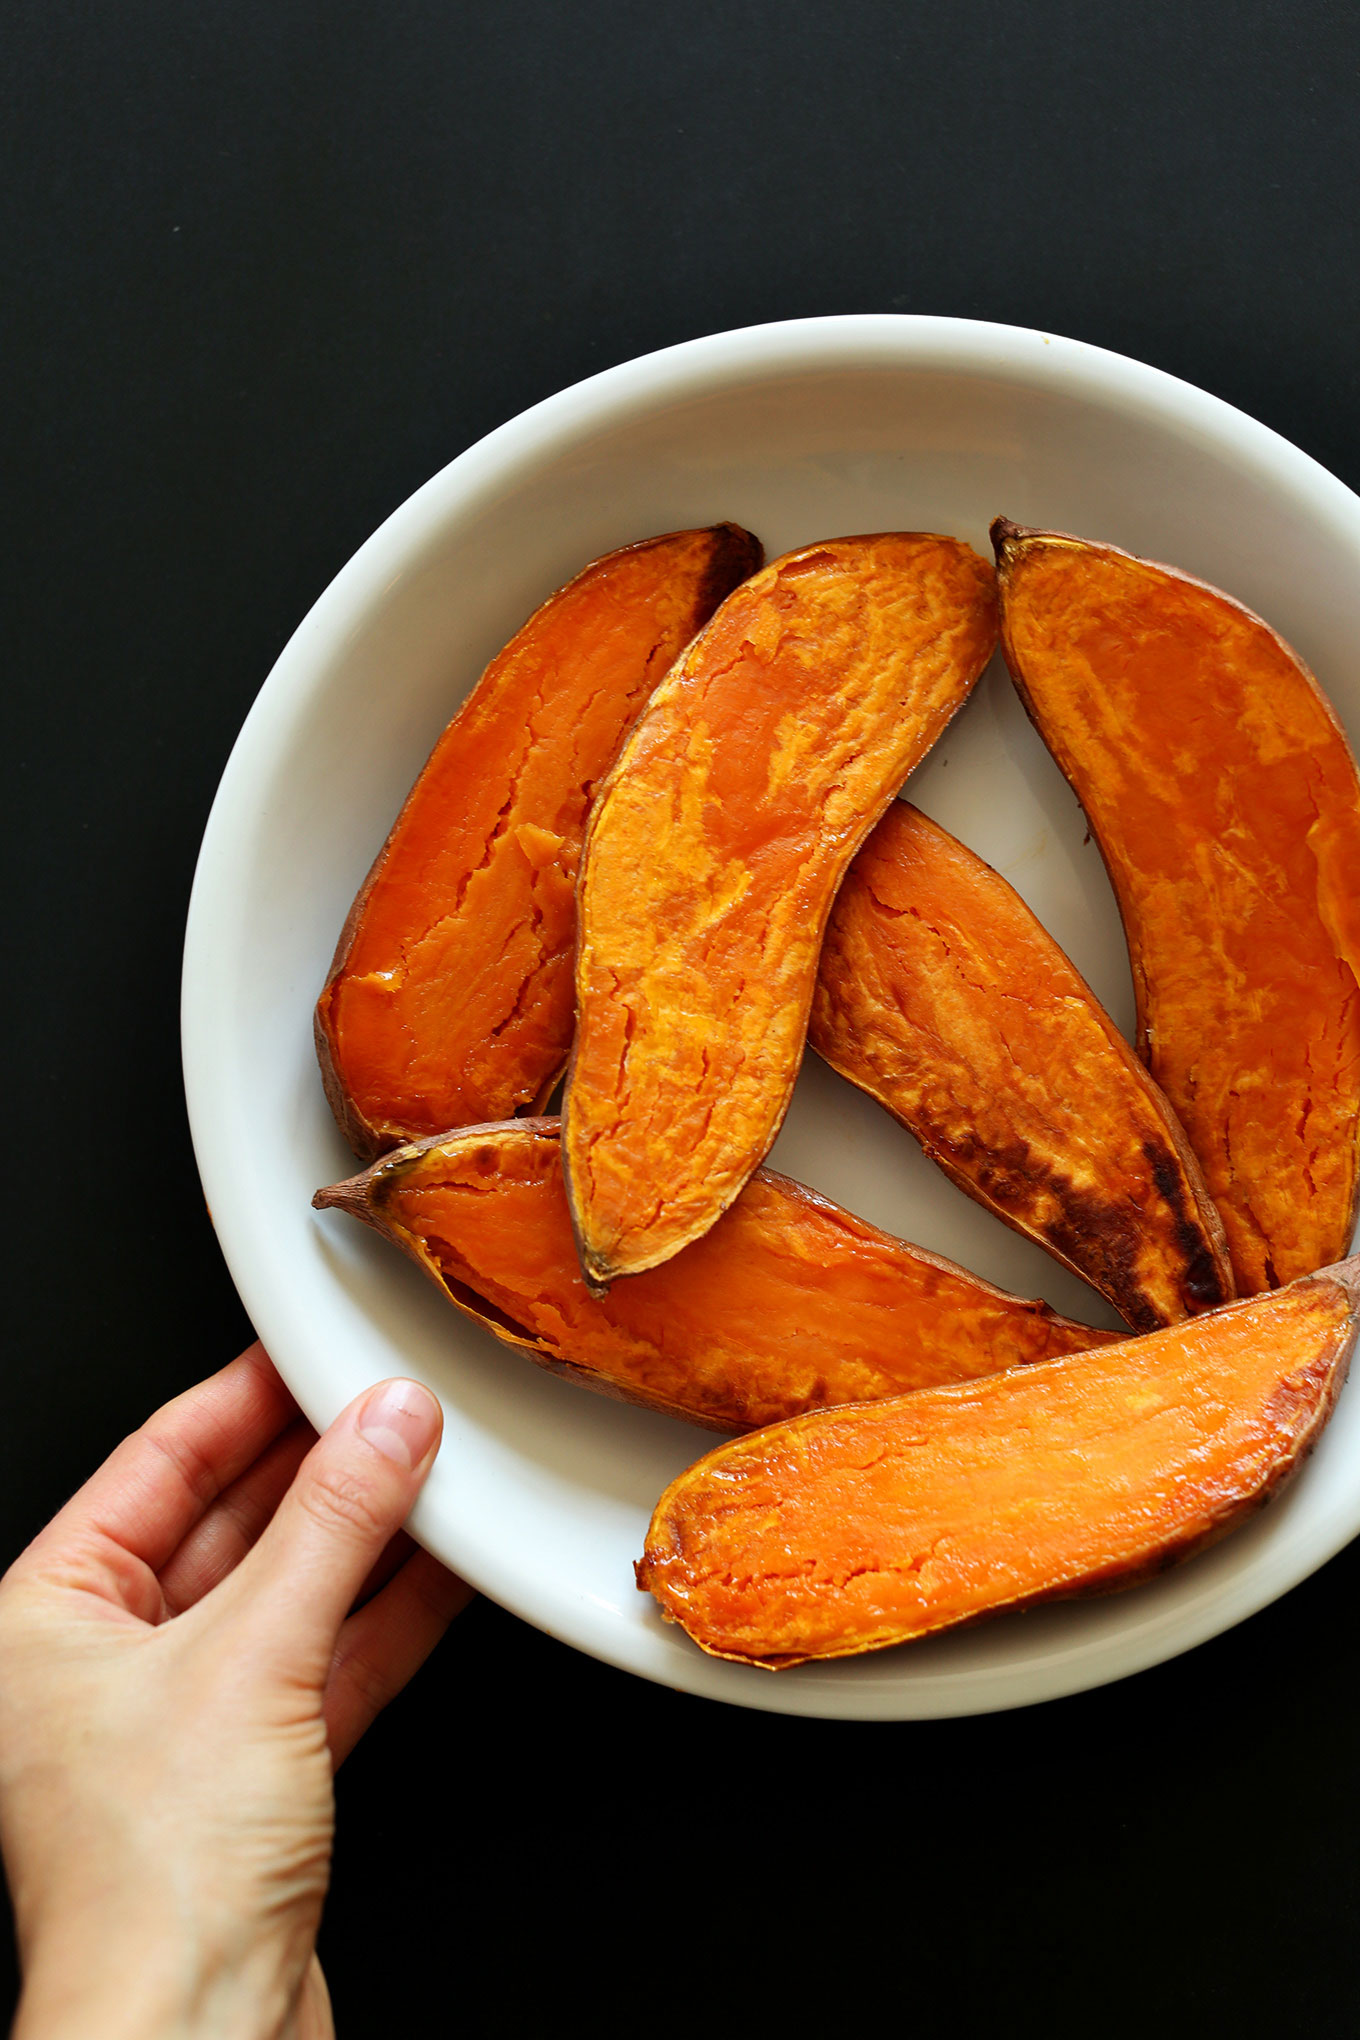 Big bowl of freshly roasted halved sweet potatoes